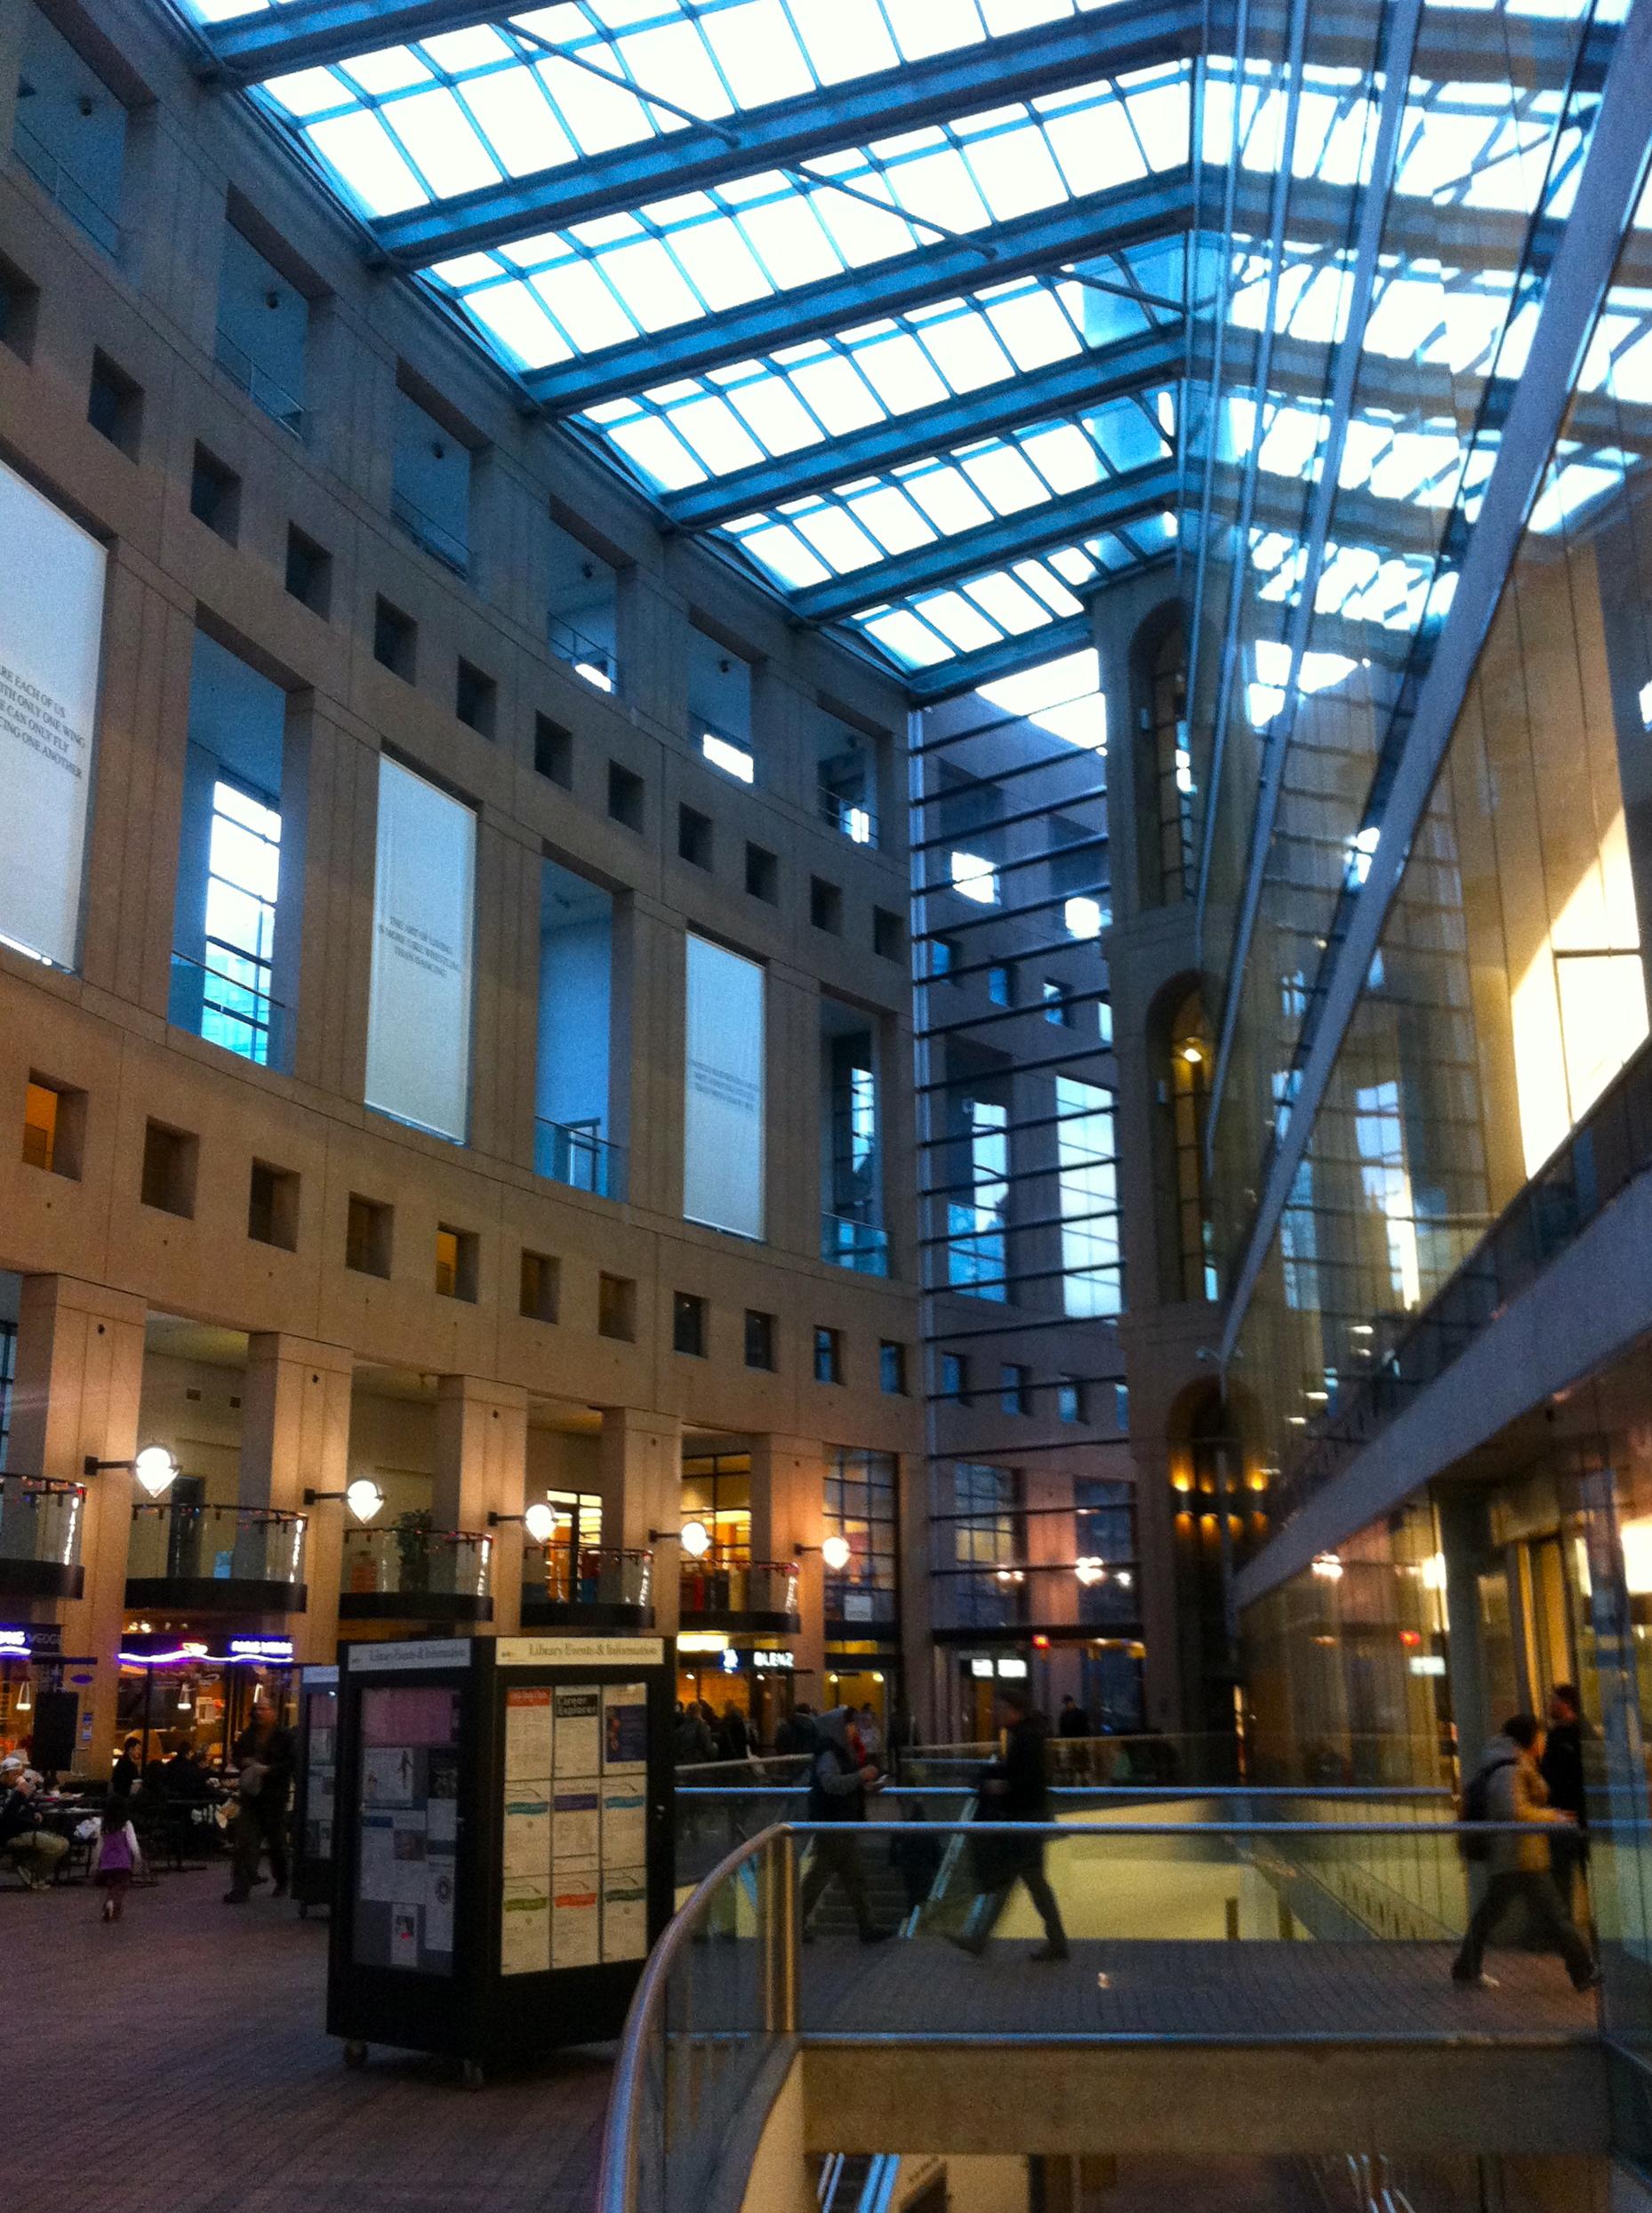 vancouver architecture | textingthecity